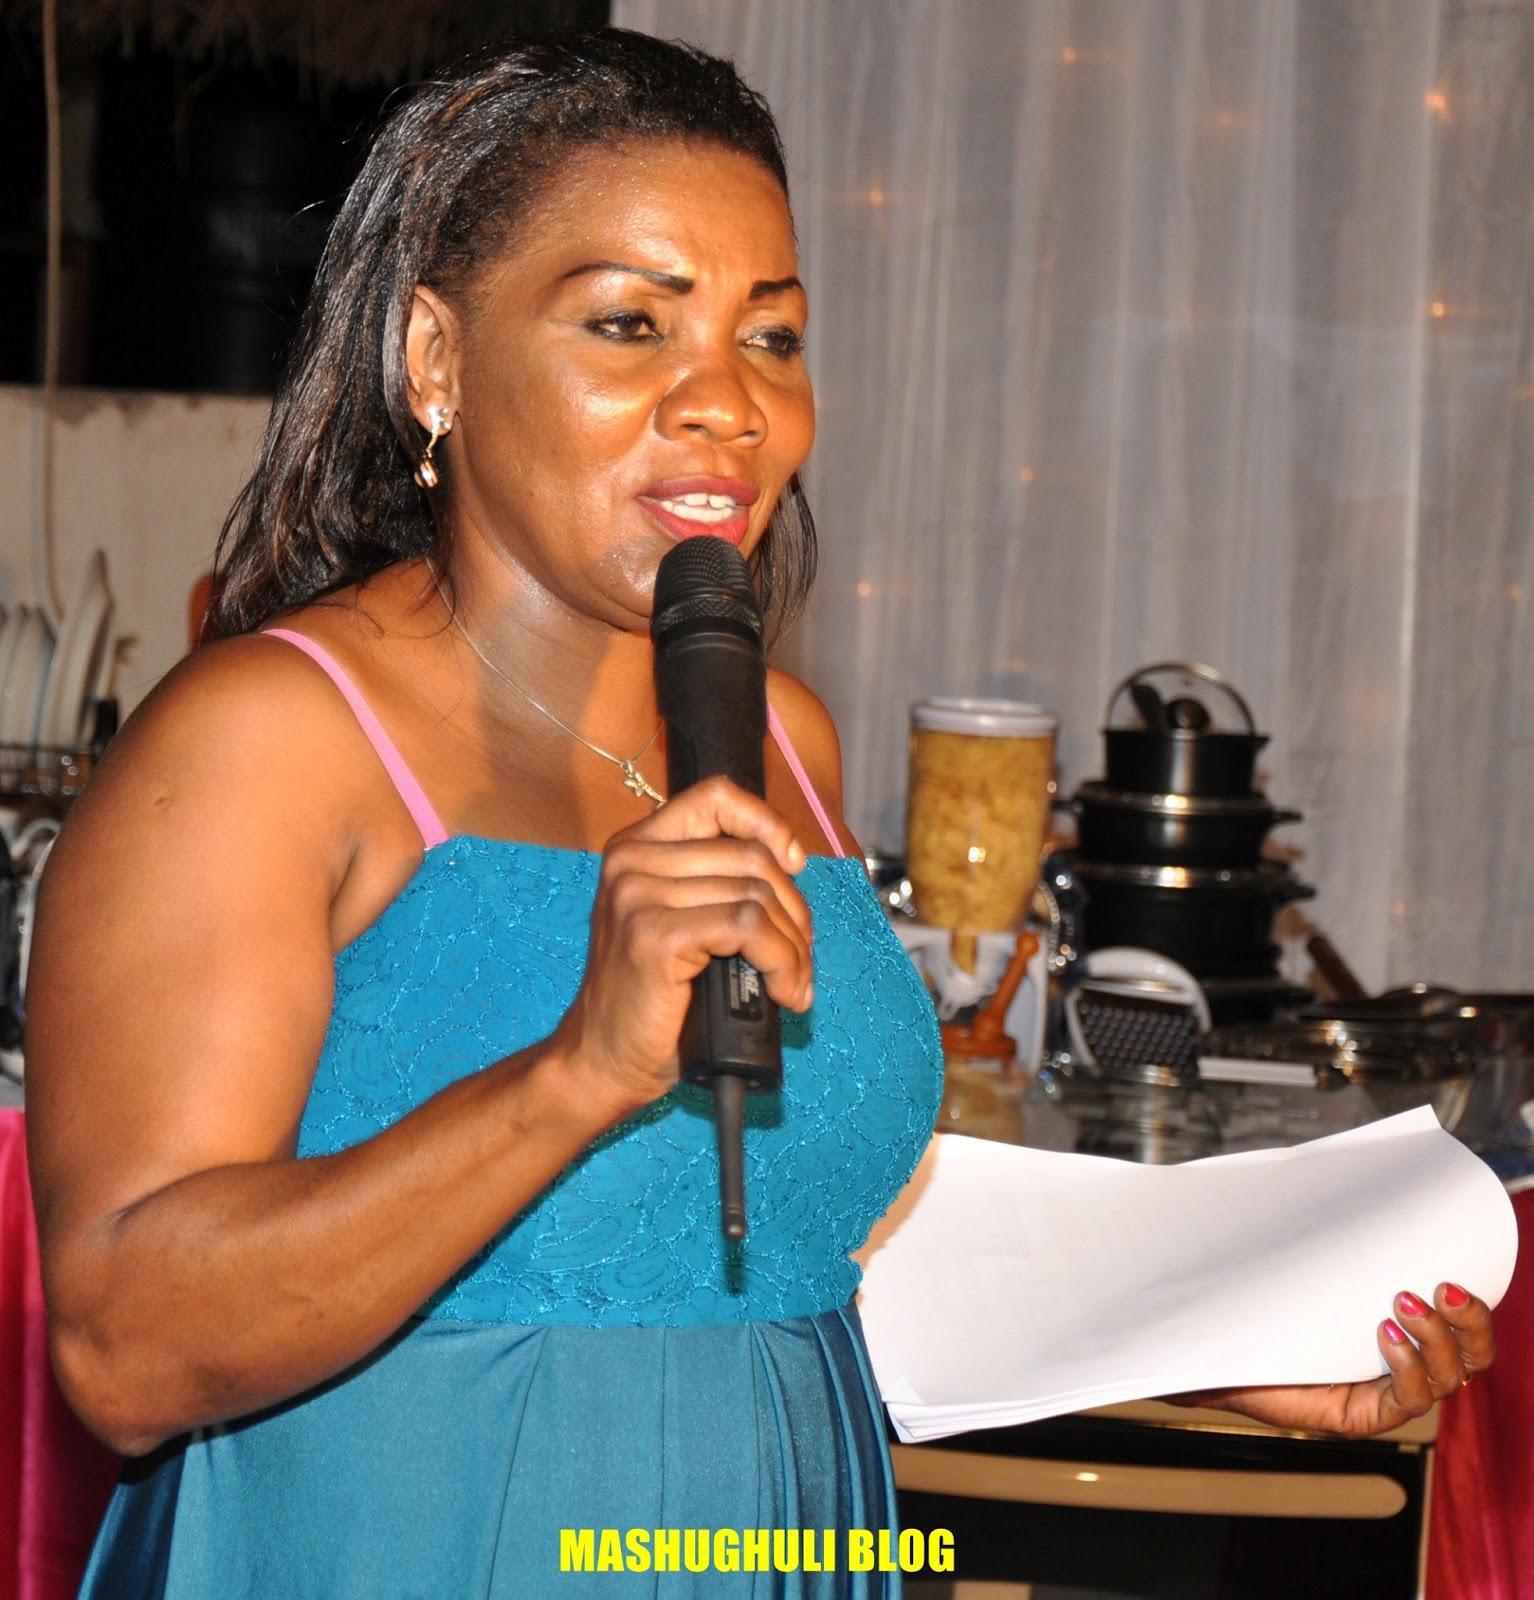 Mashughuli blog farha kitchen party